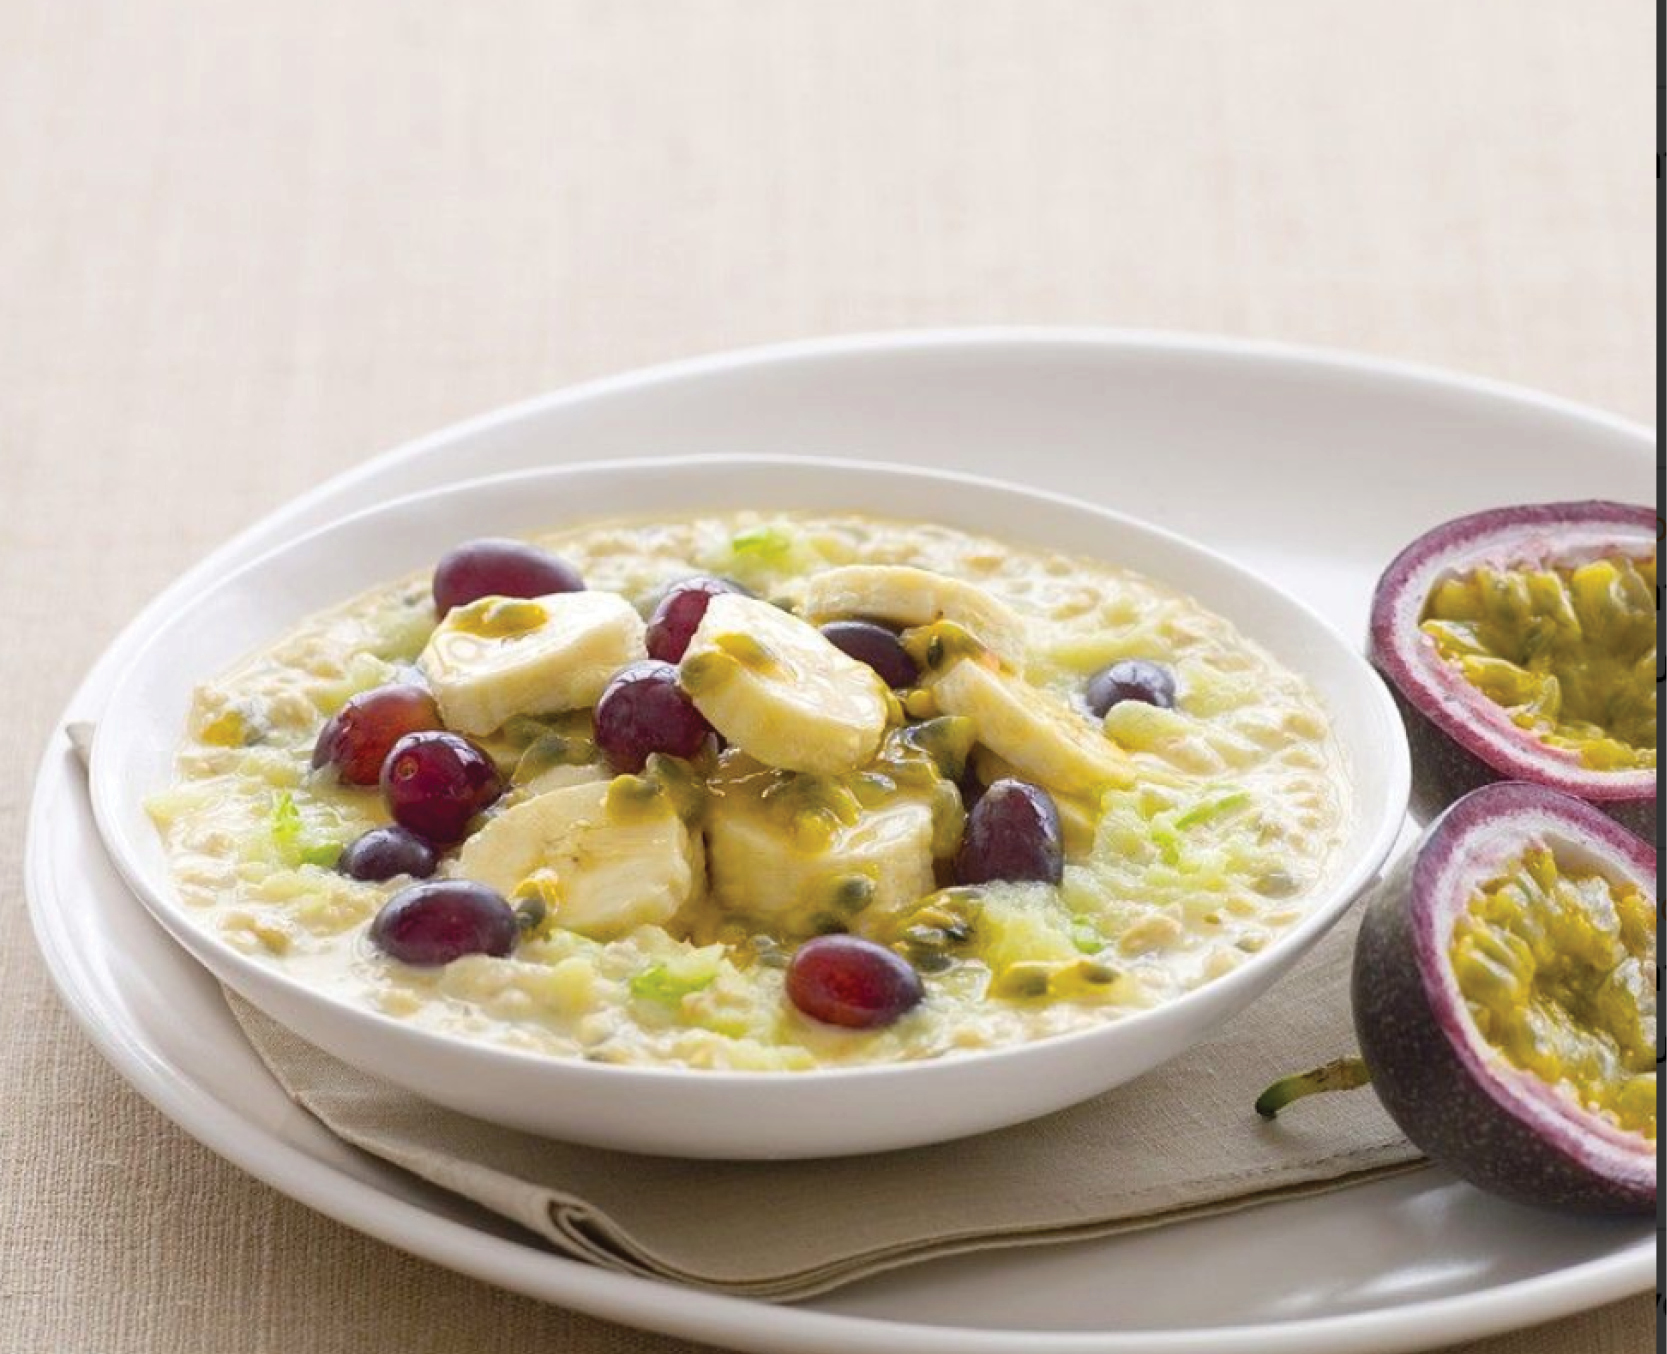 https://eatsmarter.com/recipes/overnight-oats-with-fruit